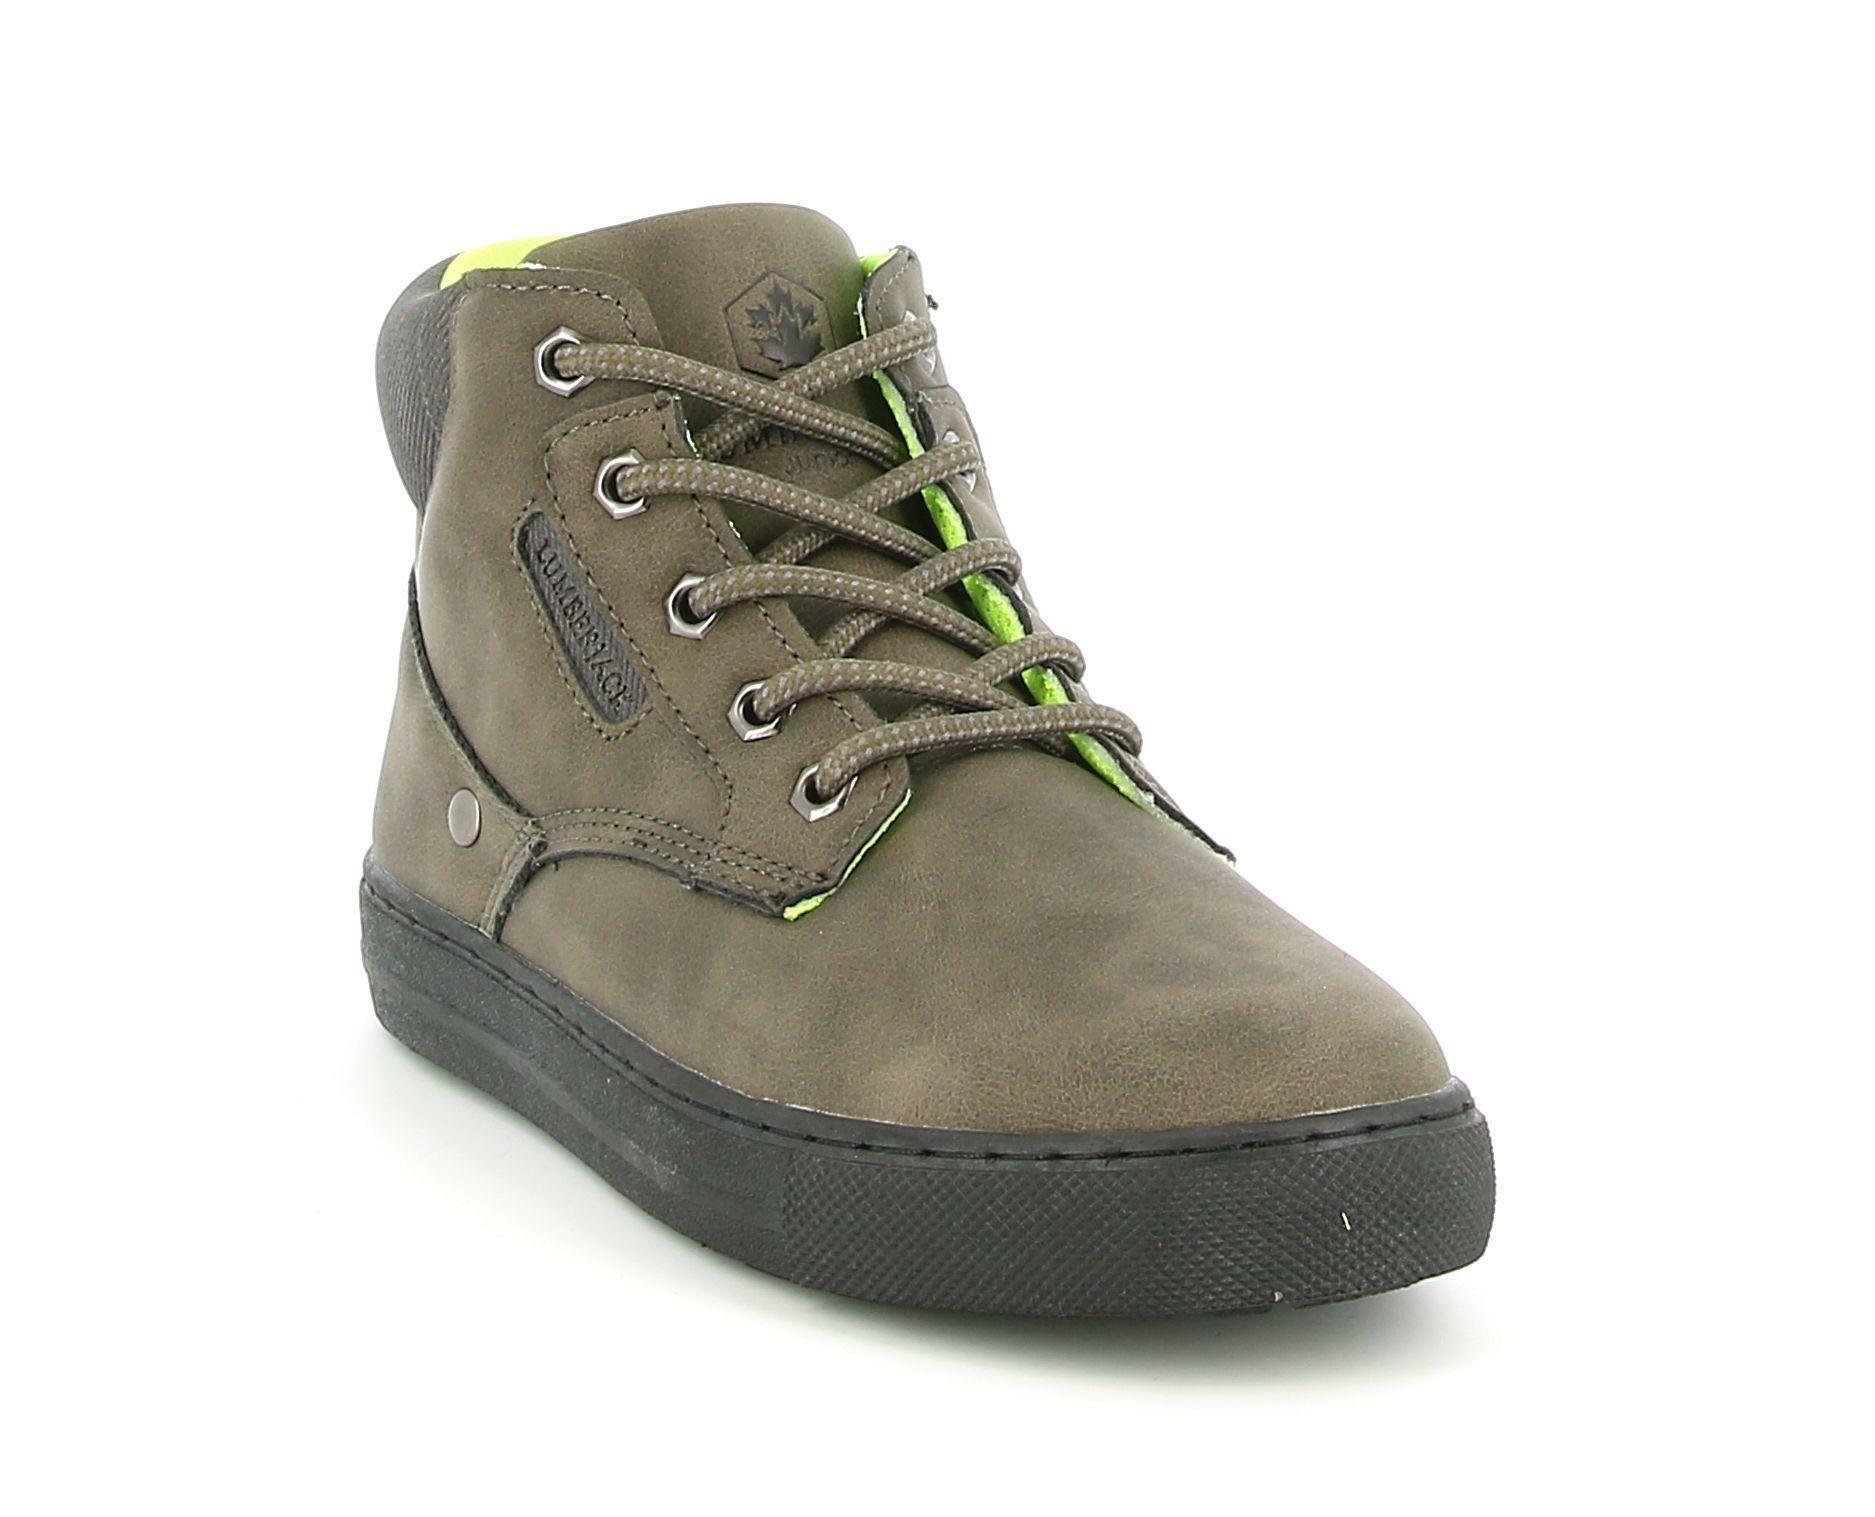 lumberjack lumberjack sb64601-003 s03 sneakers king sneakers alta bambino verde